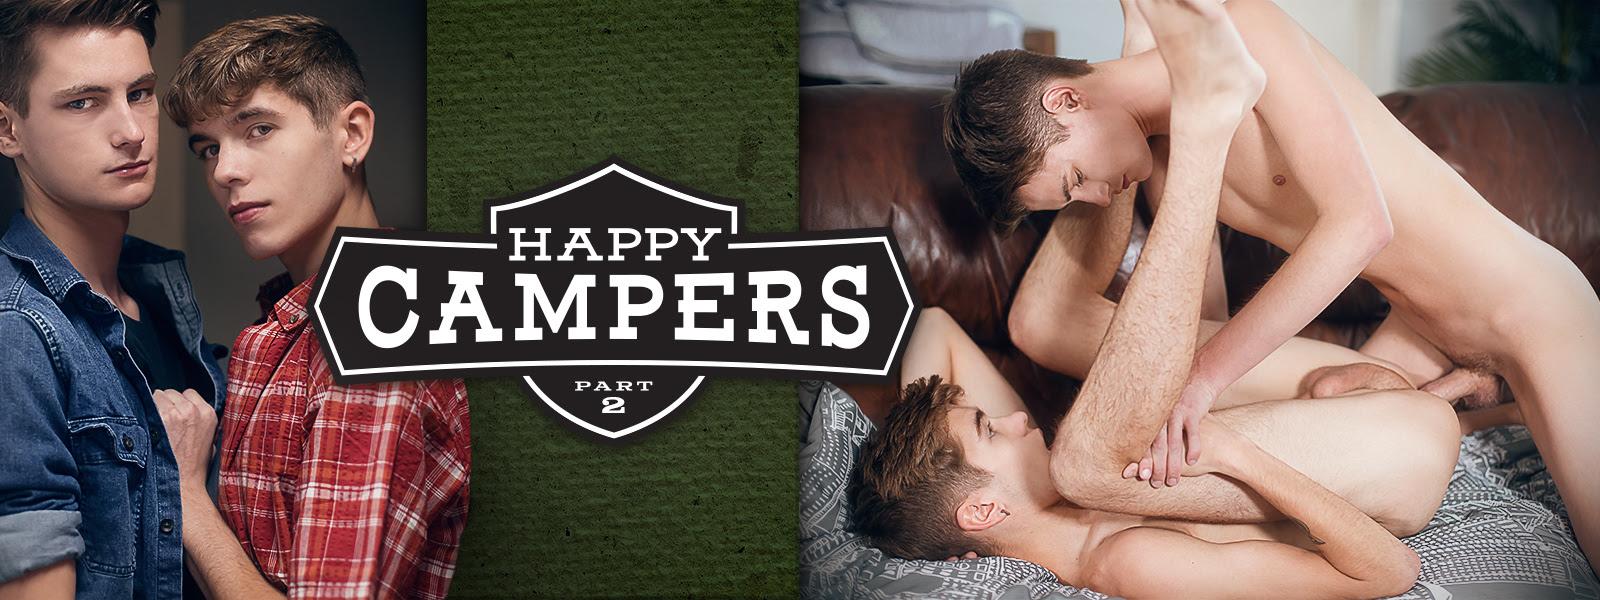 Happy Campers: Part 2